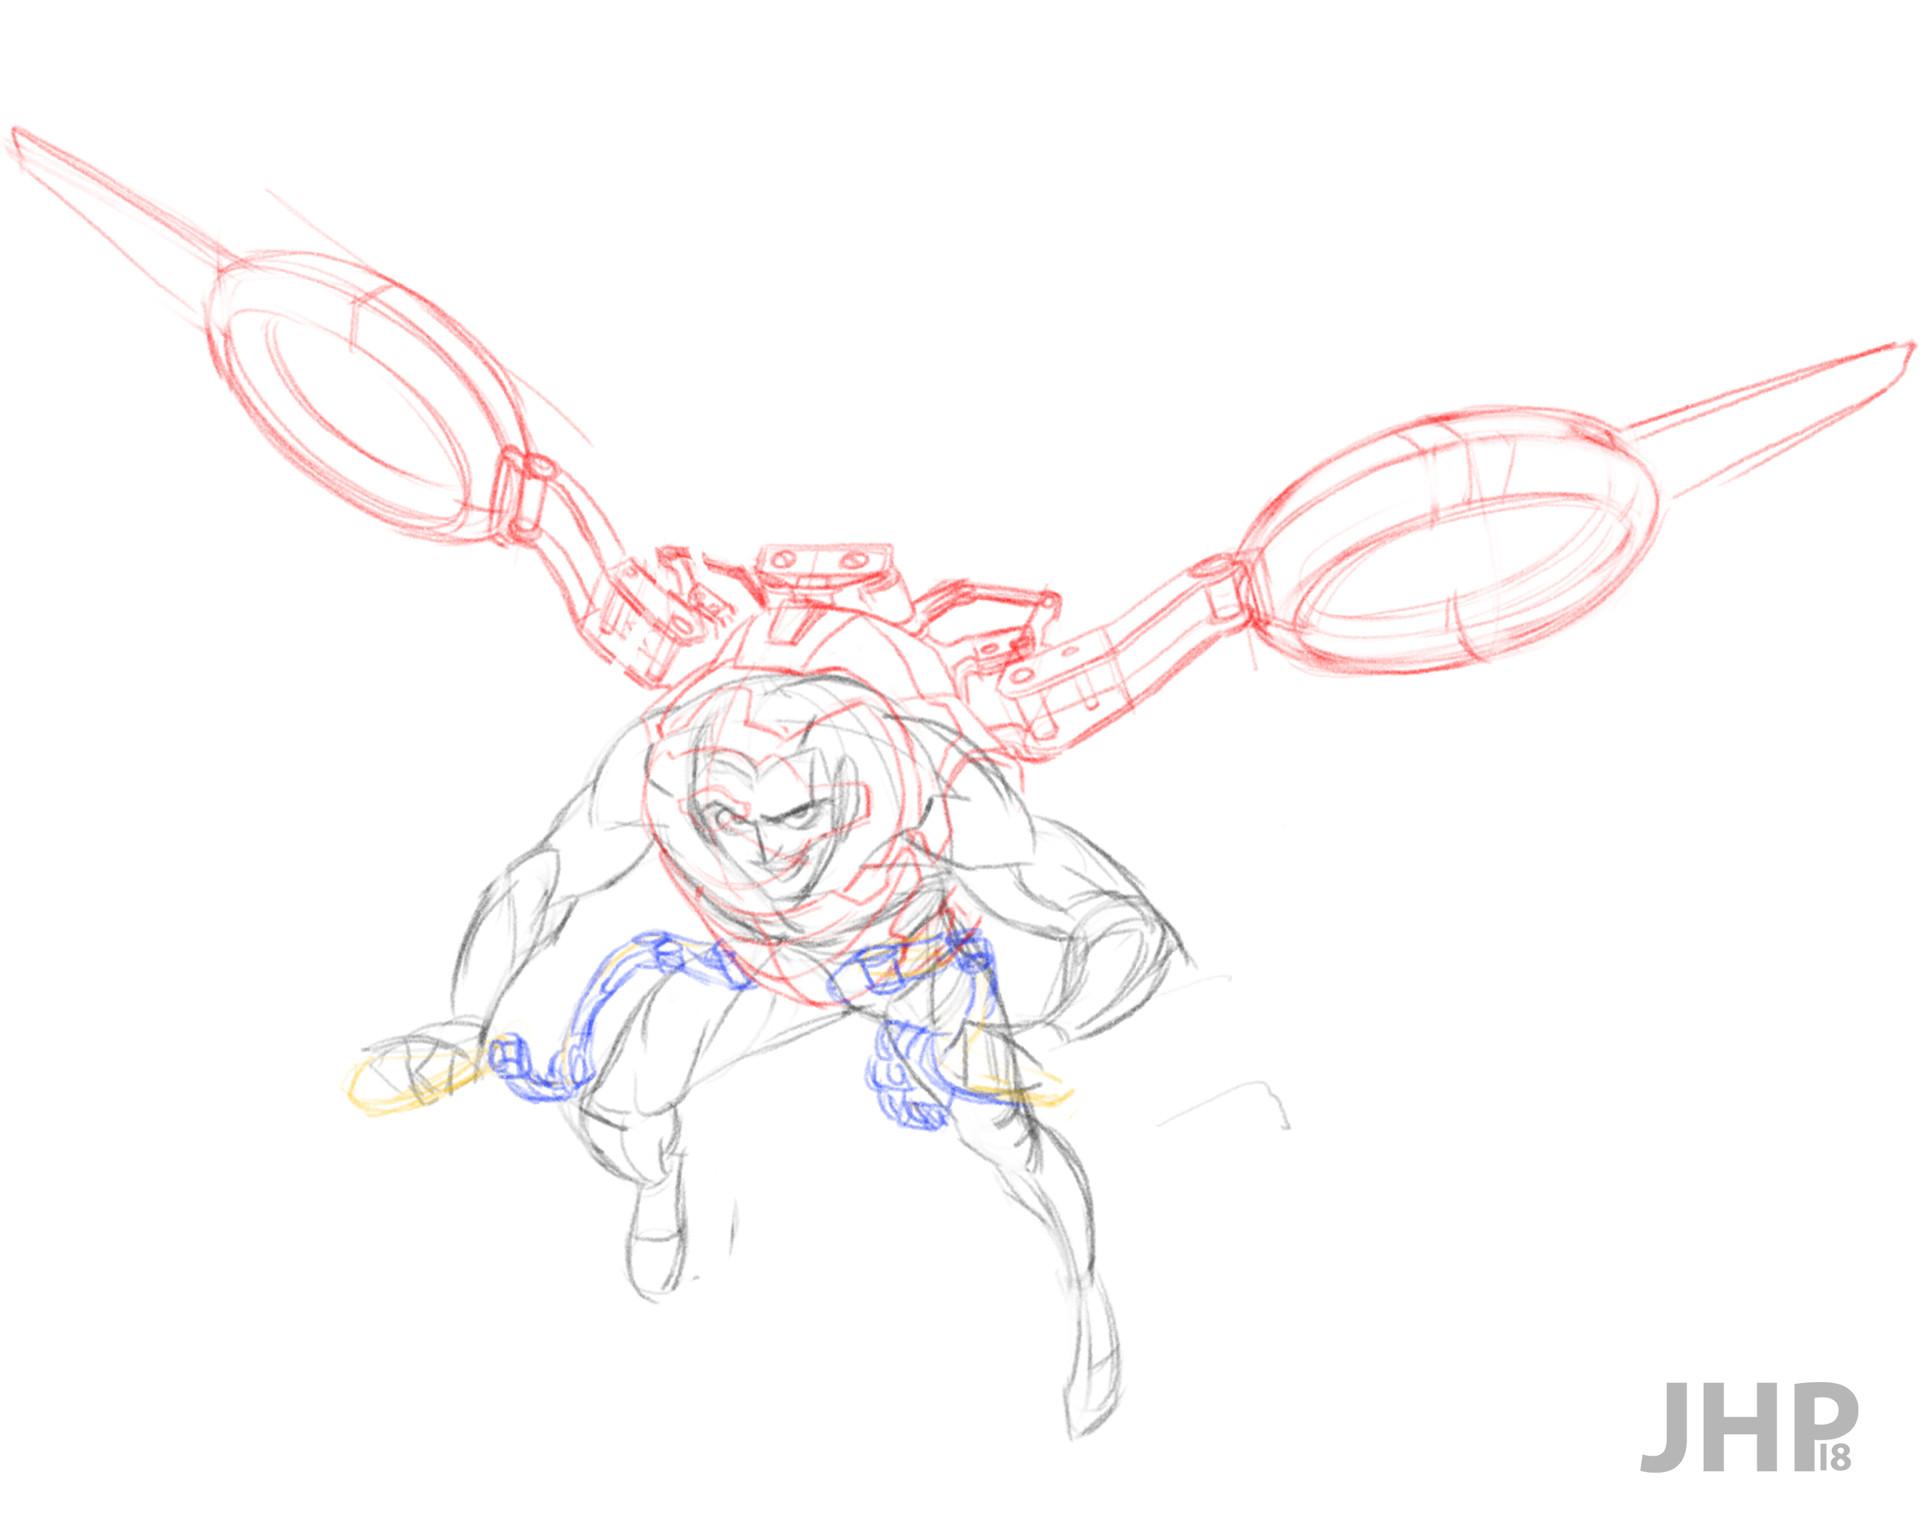 Joao henrique pacheco jetplane sketch